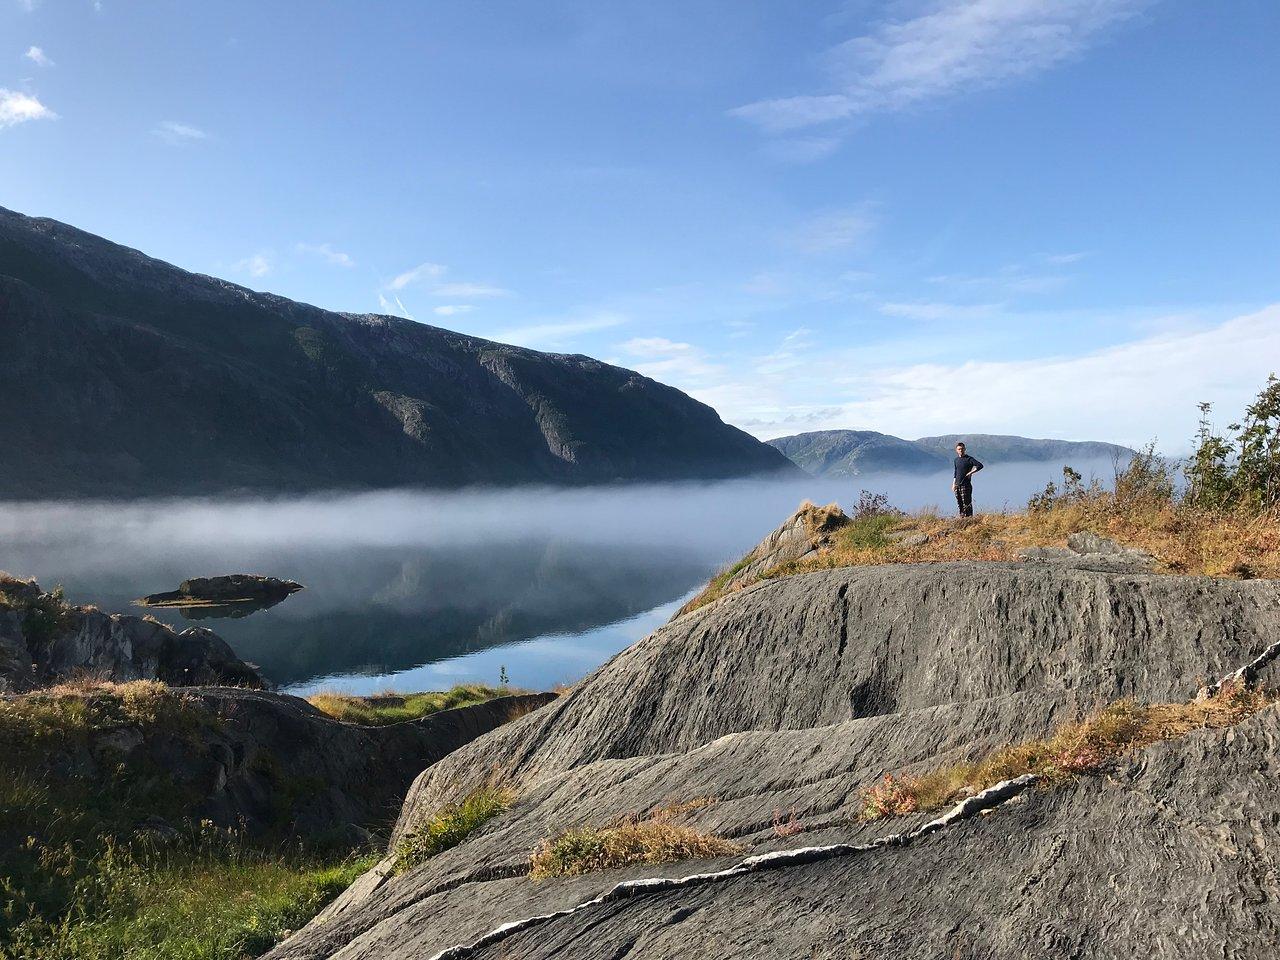 leirfjord dating site